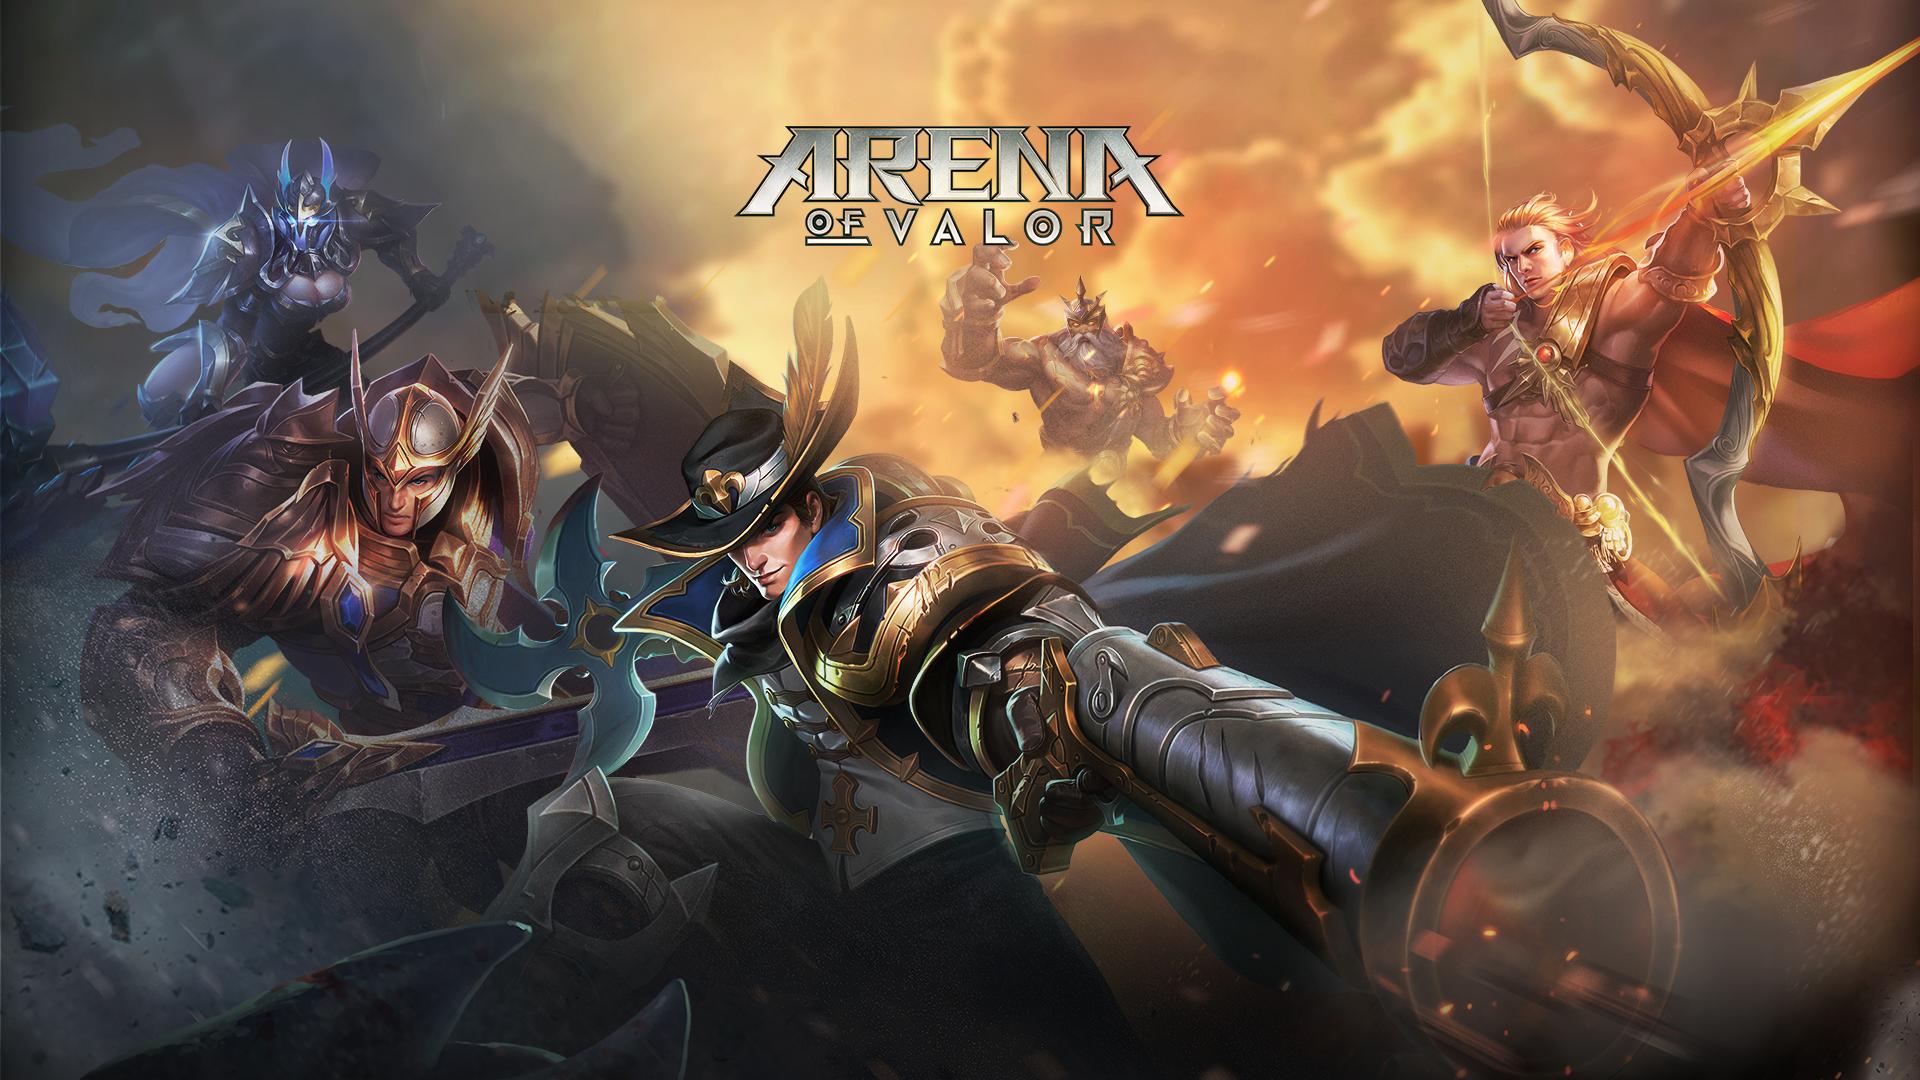 Mini Matia Arena, Multiplayer games, Android